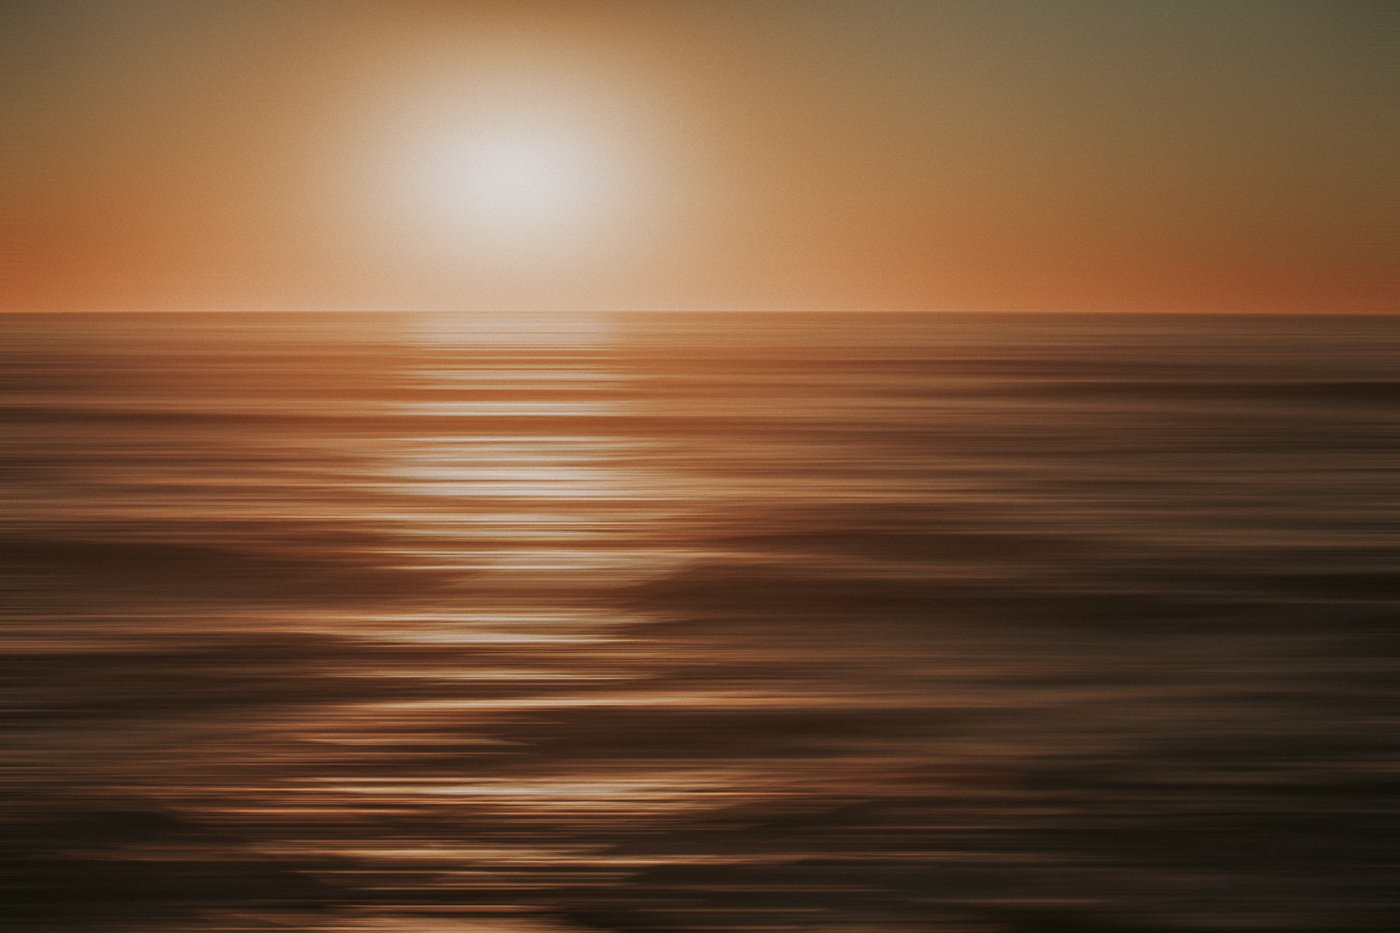 Sunset cliffs san diego california